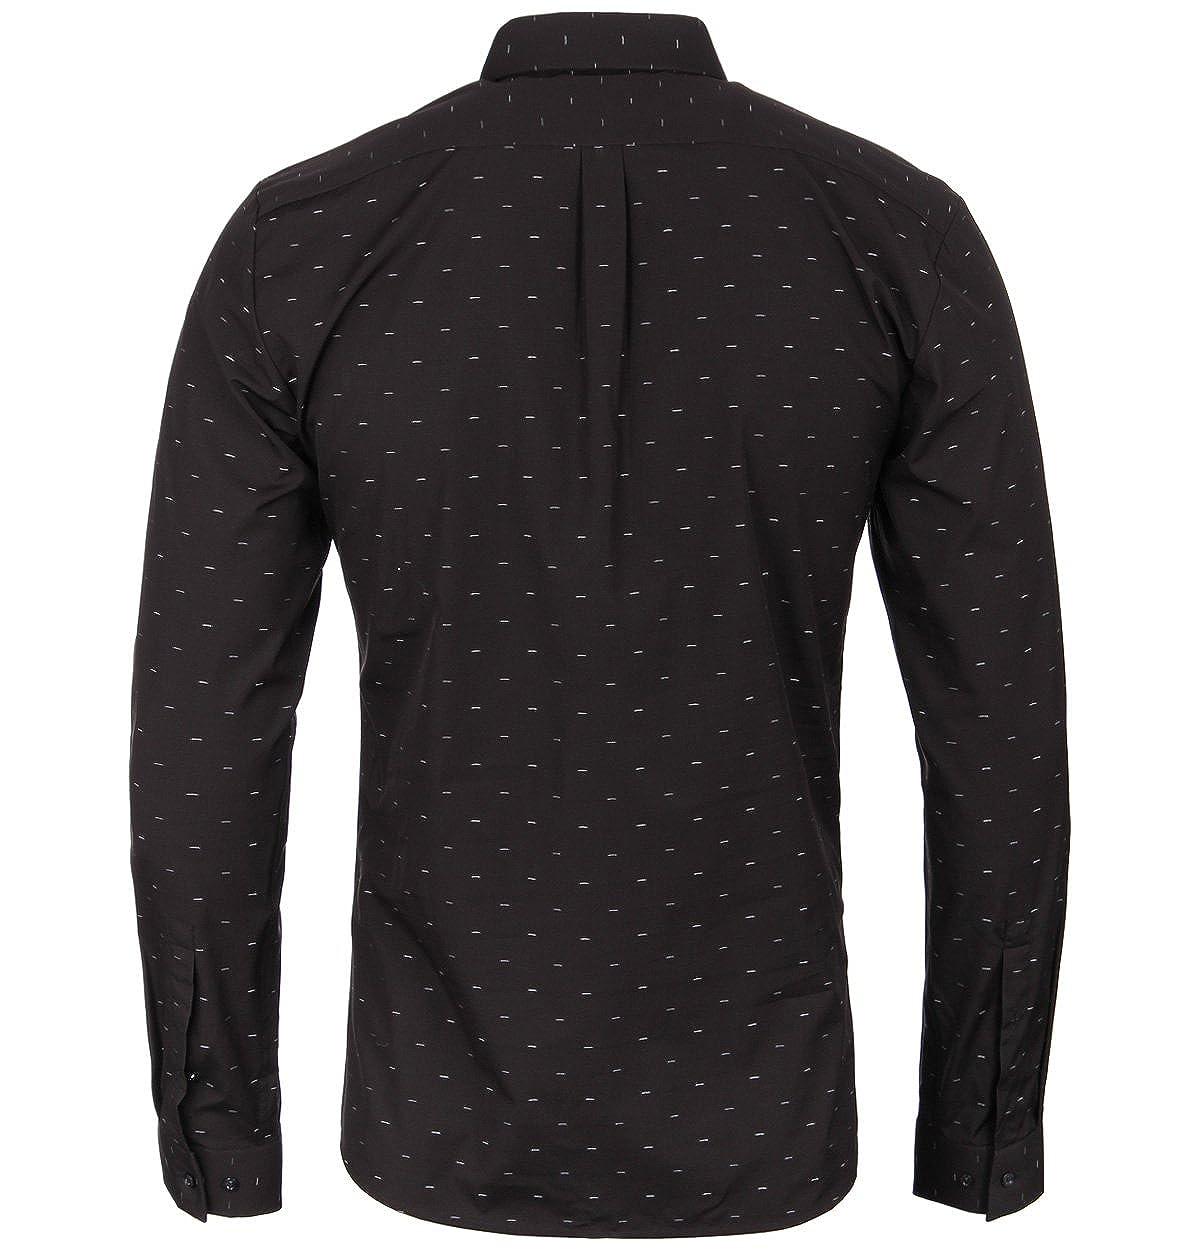 62790c212 Amazon.com: Hugo Boss Ero3 Mens Slim Fit Shirts (XLarge): Clothing